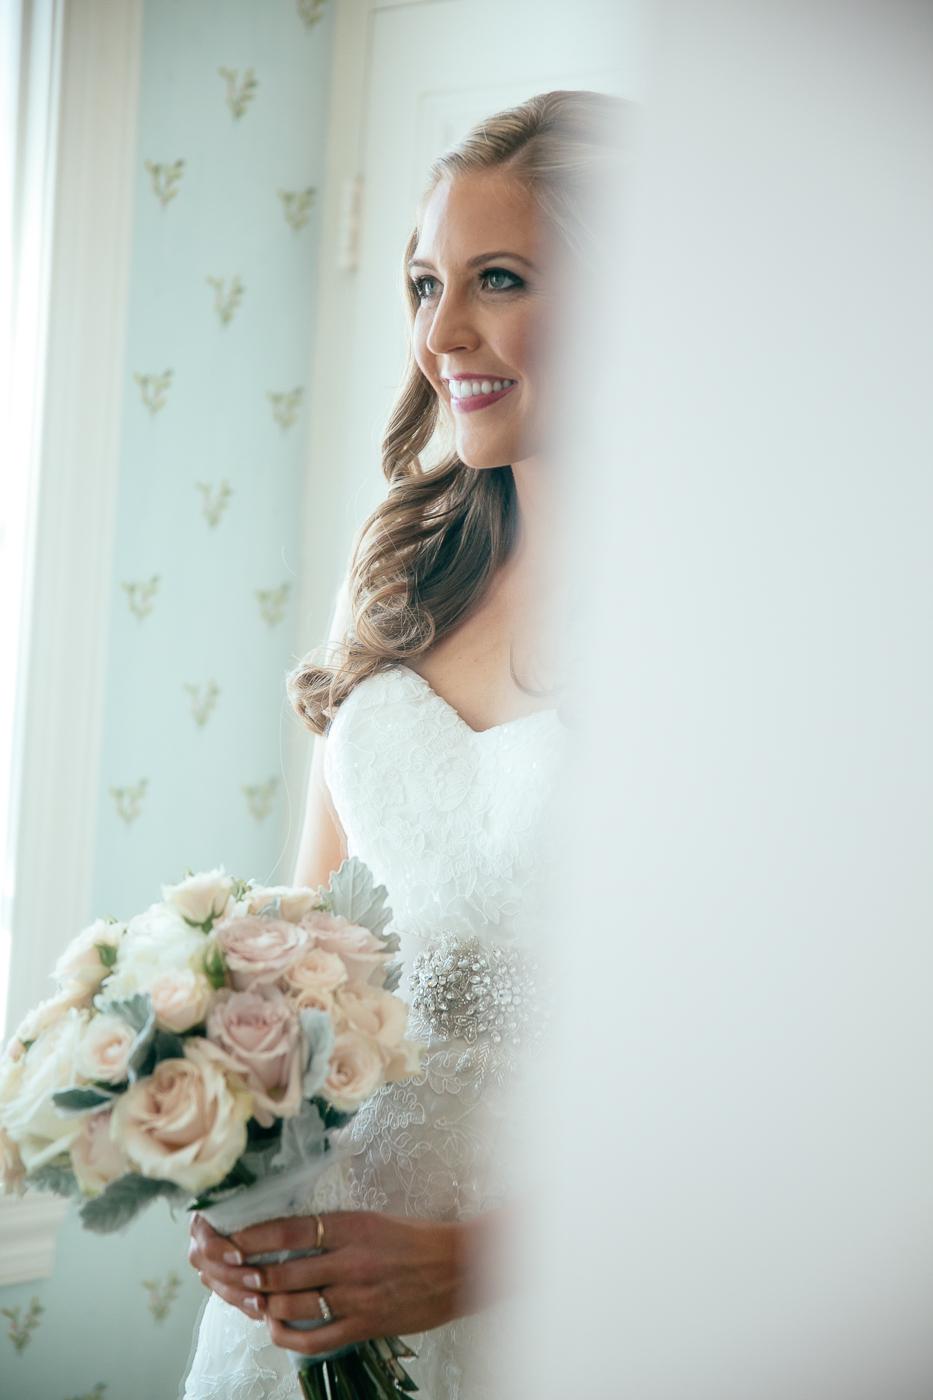 RYAN_&_KELLEY_DARLINGTON_HOUSE_WEDDING_2014_7X9A1733.JPG